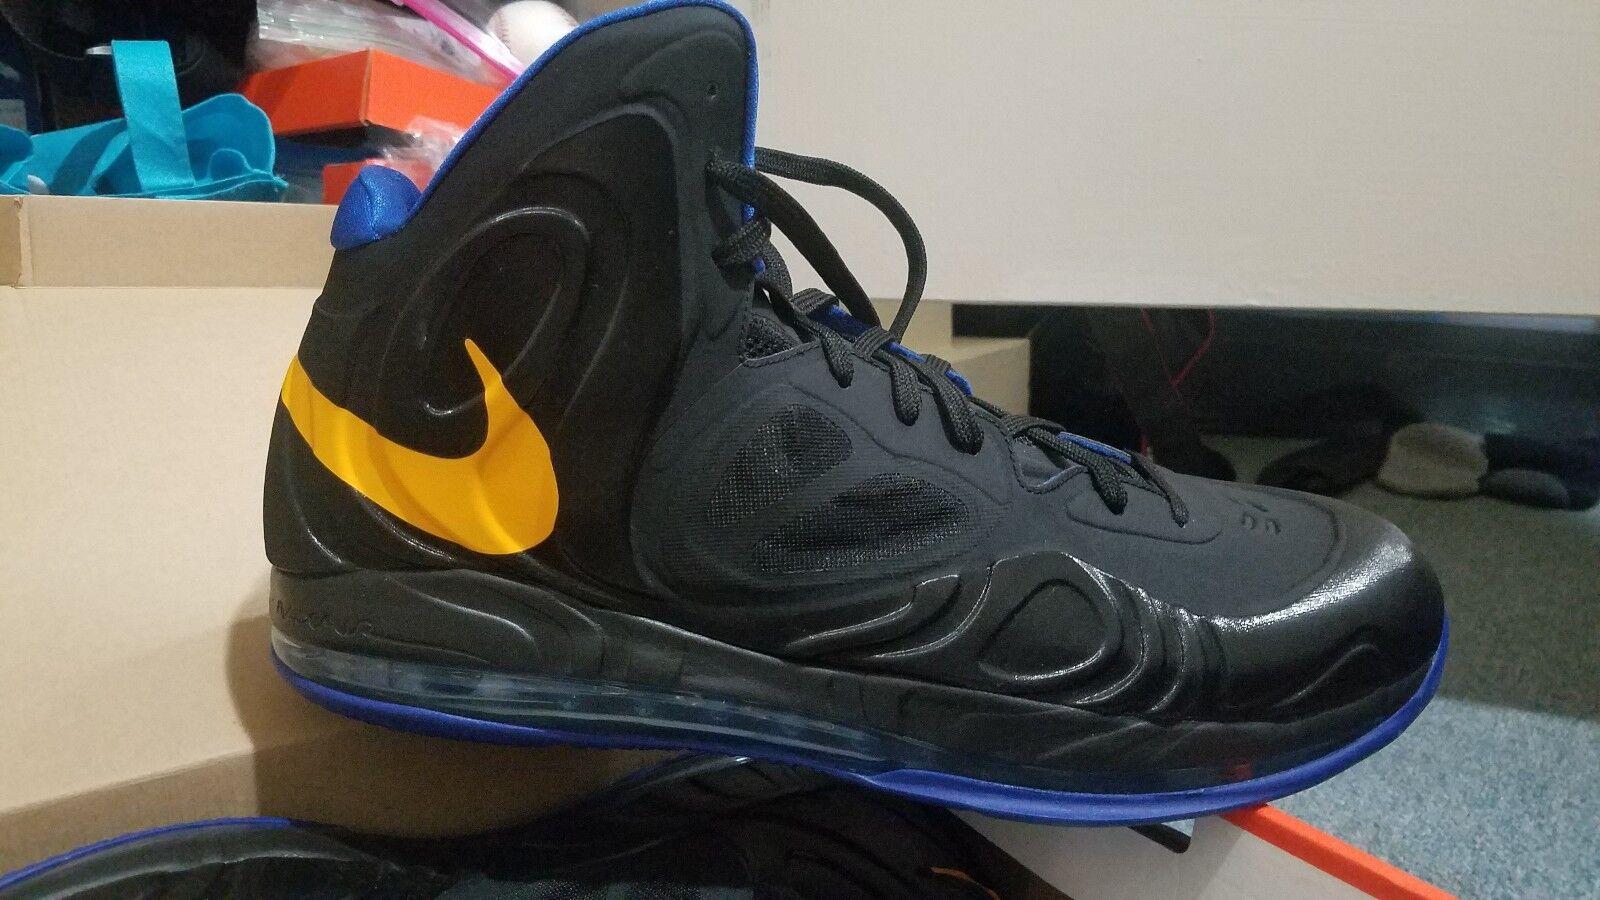 Nike Hyperposite David Lee PE golden state Warriors Player Exclusive 2012